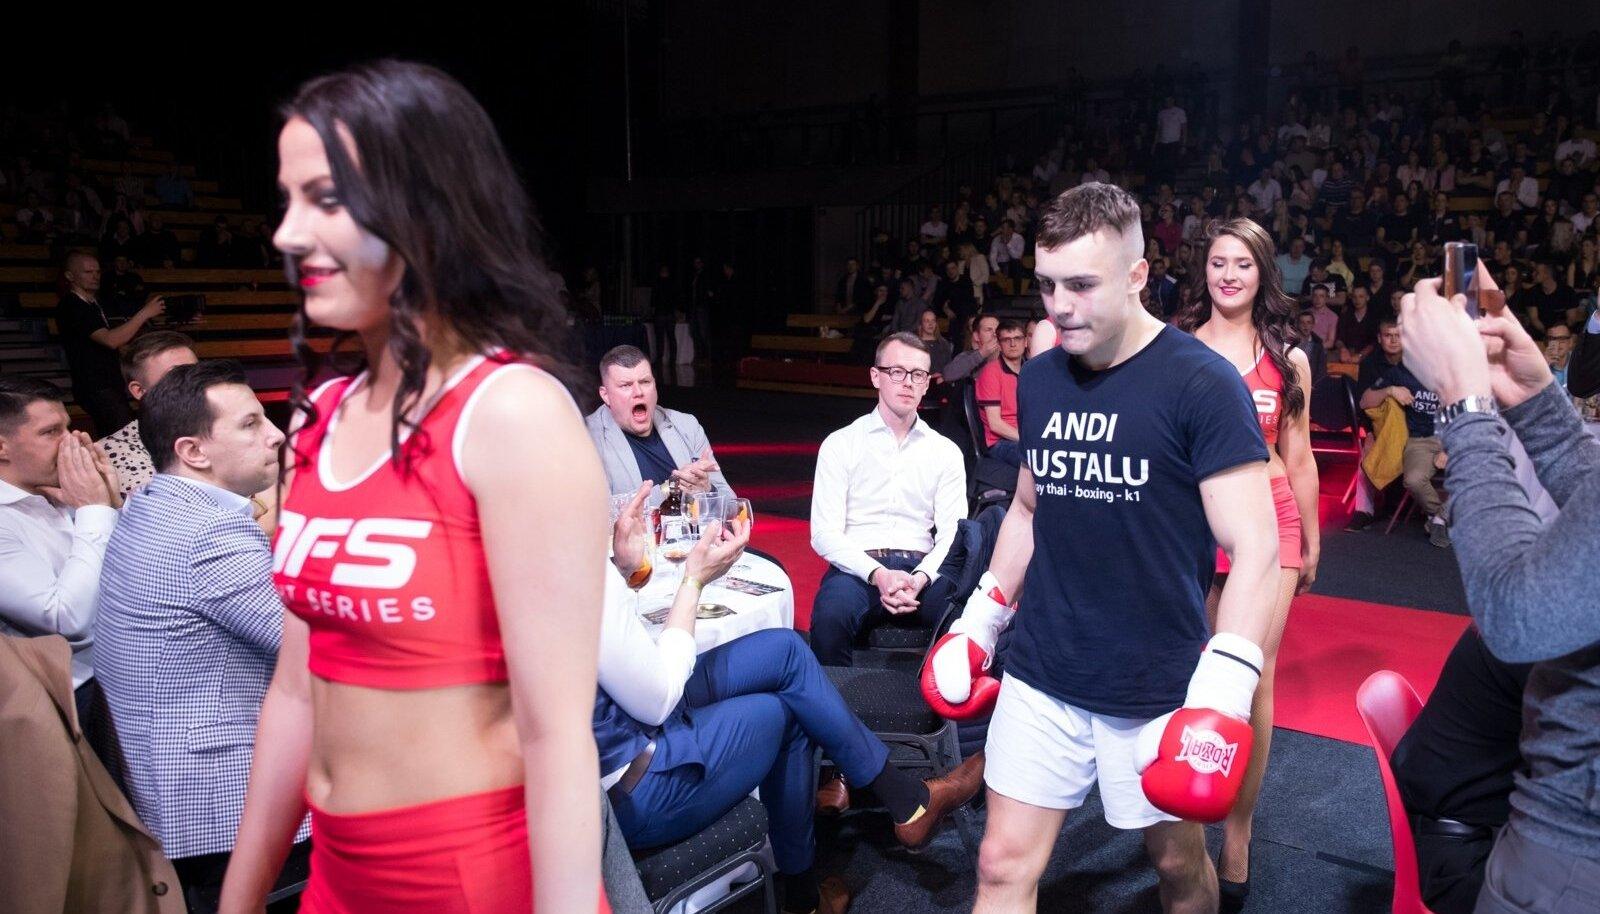 Duel 1 Fight Series Tartus A. Le Coqi spordihoones.